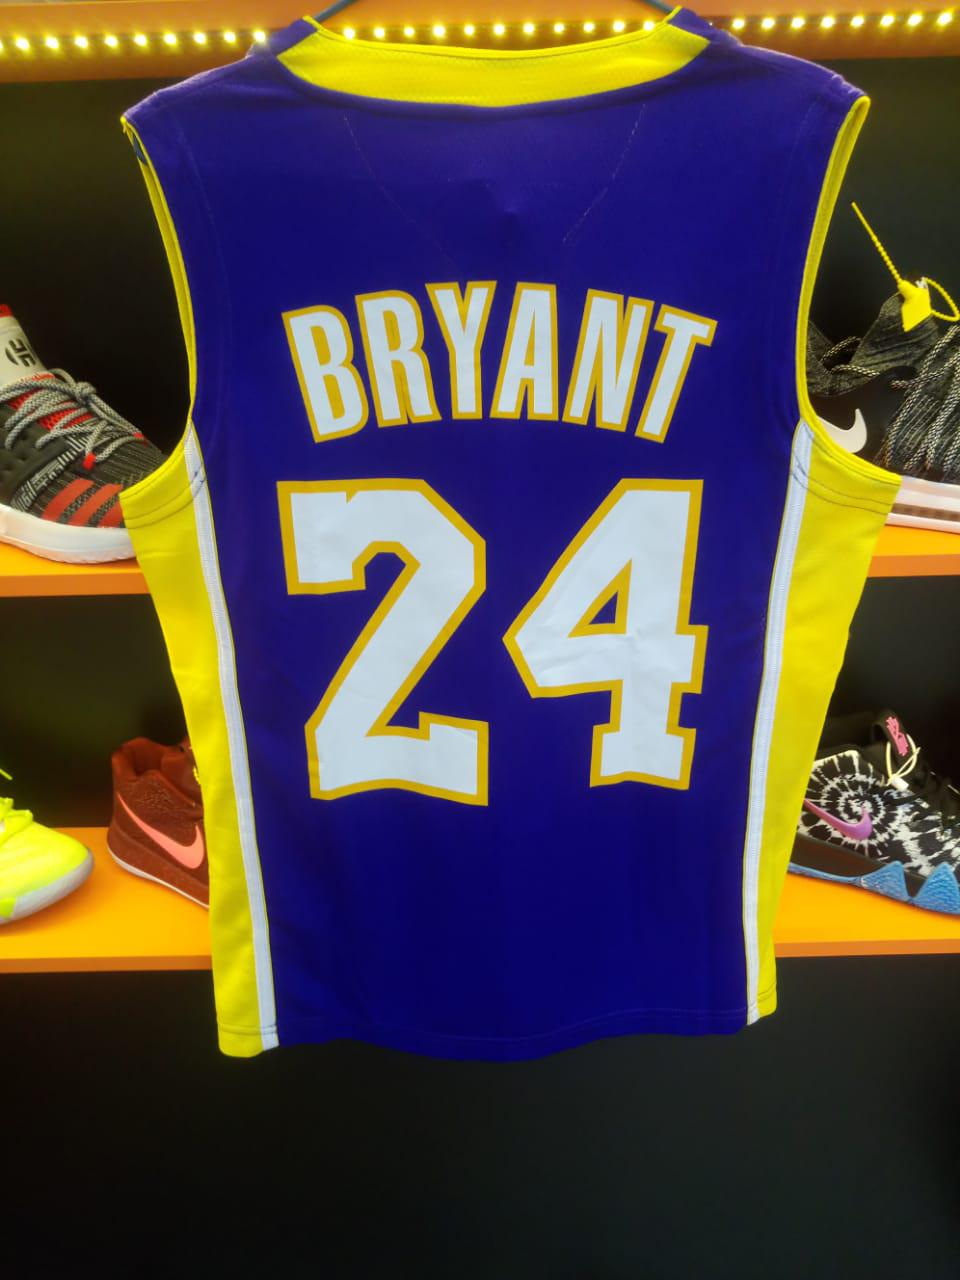 Баскетбольная форма Los Angeles Lakers - фото 1